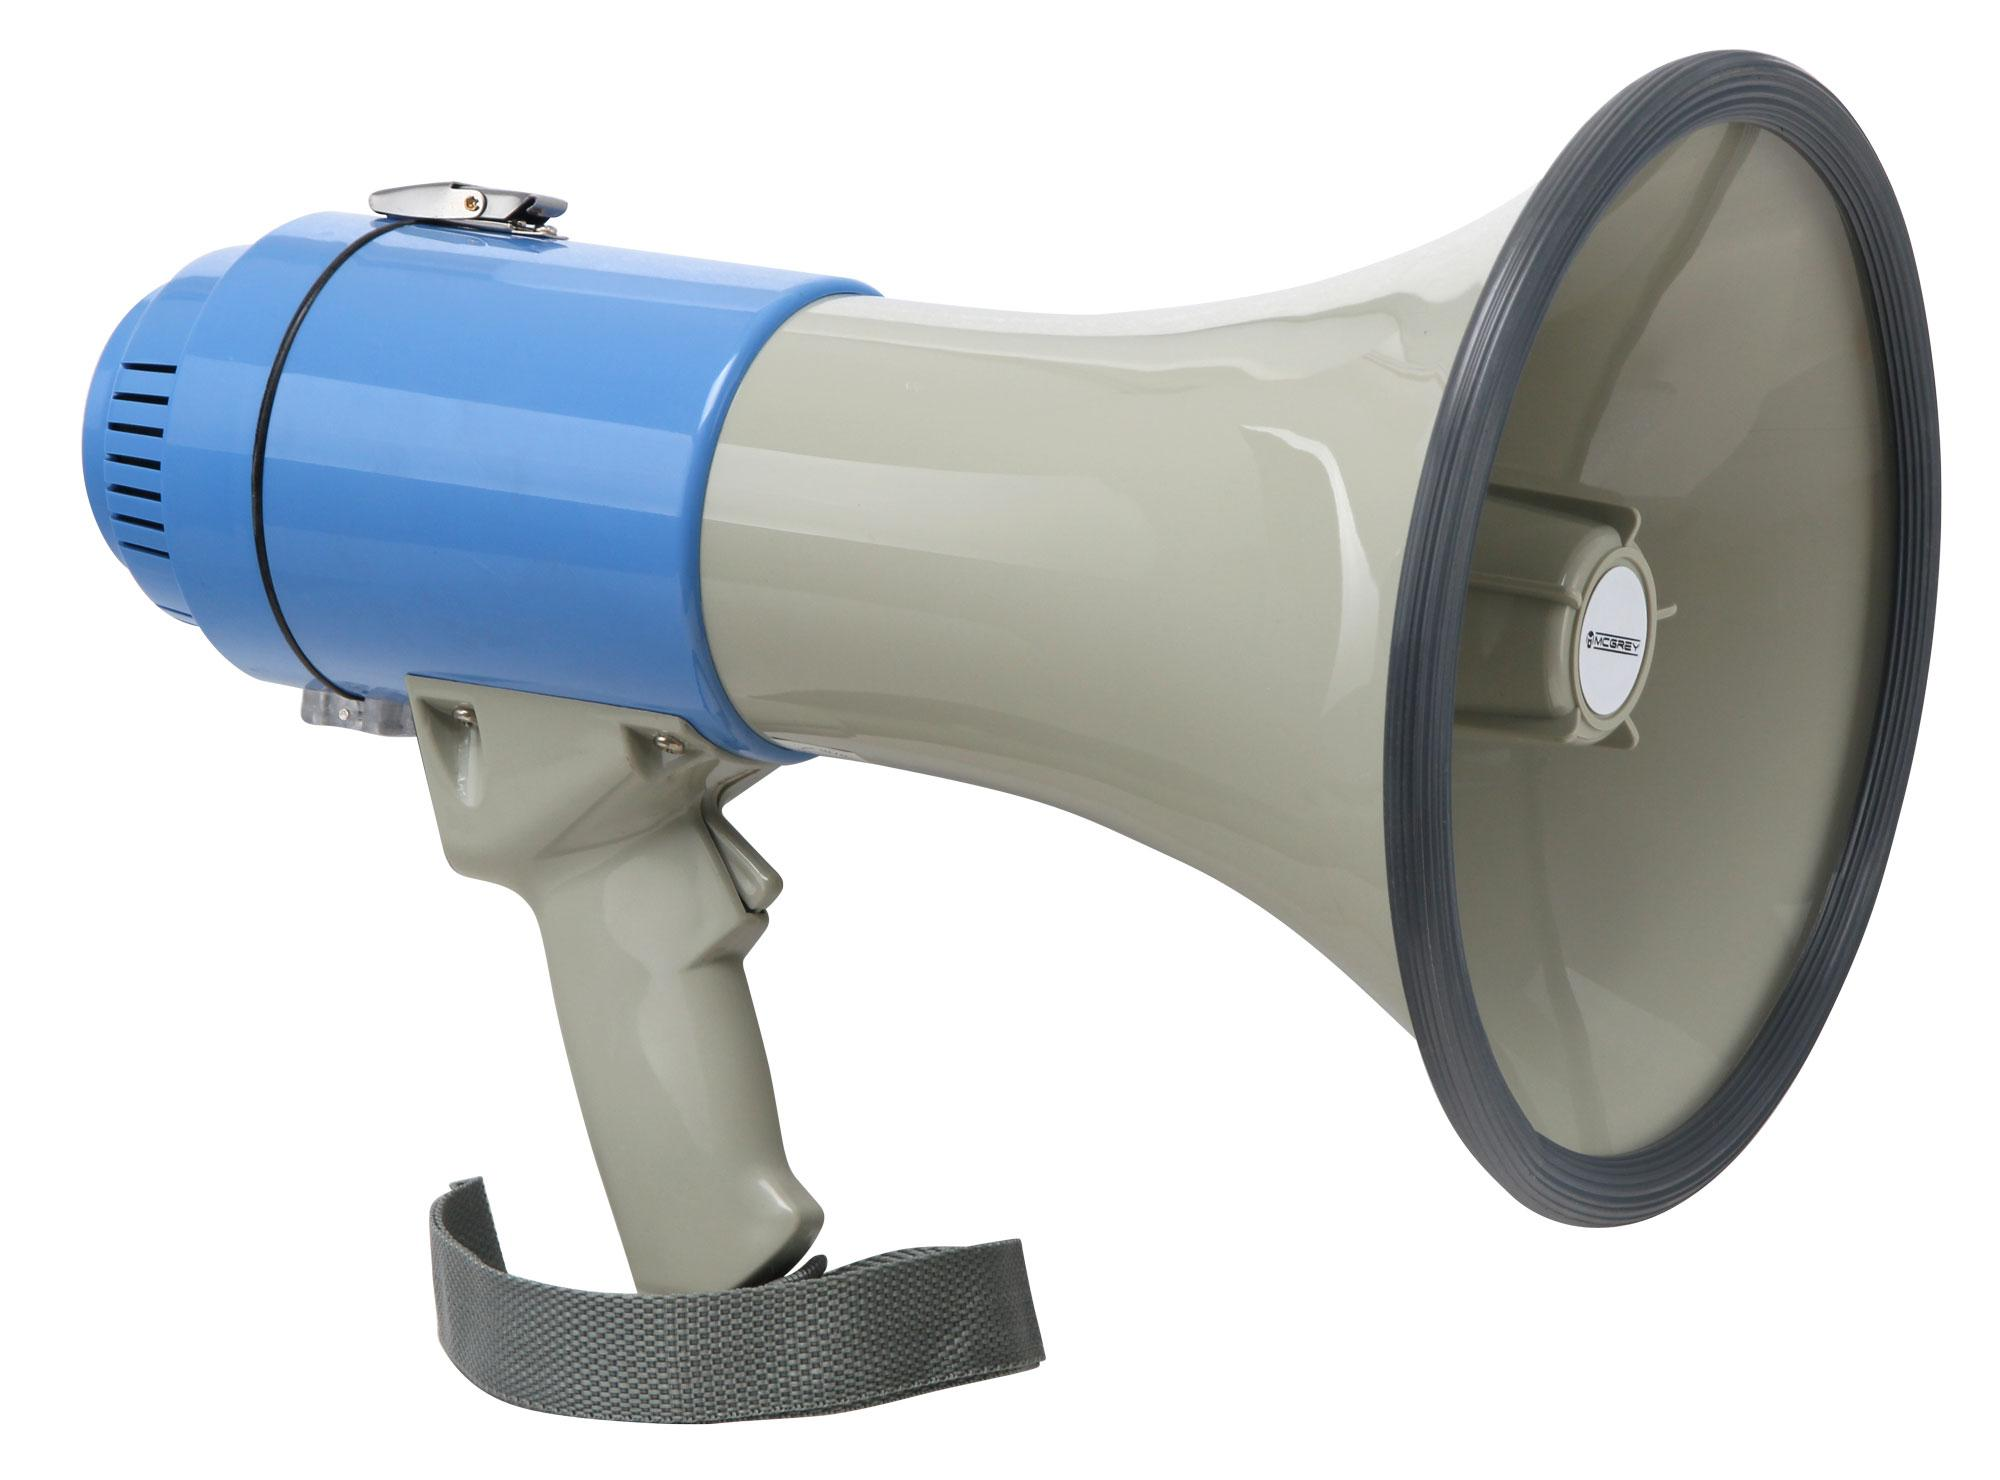 McGrey MP 200S Megaphon, max. 60 Watt, 1000m